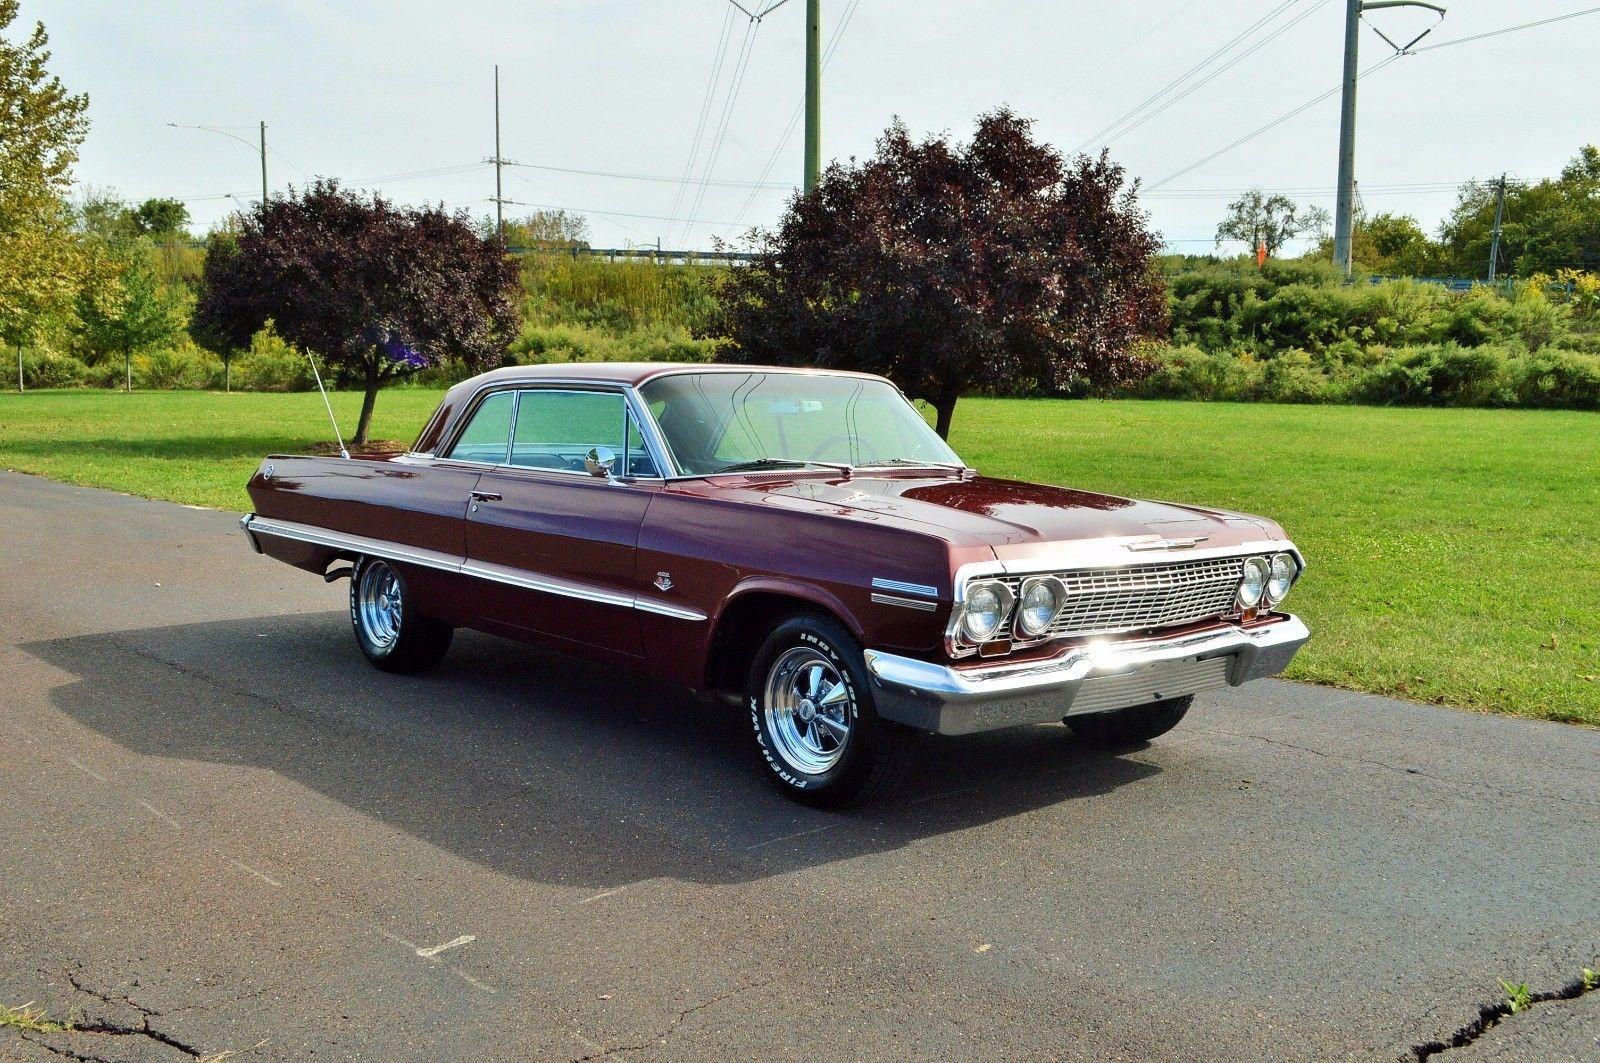 2018 chevrolet impala convertible. fine chevrolet nice great 1963 chevrolet impala ss chevy impala 409 numbers matching  rare options car truck in 2018 chevrolet impala convertible